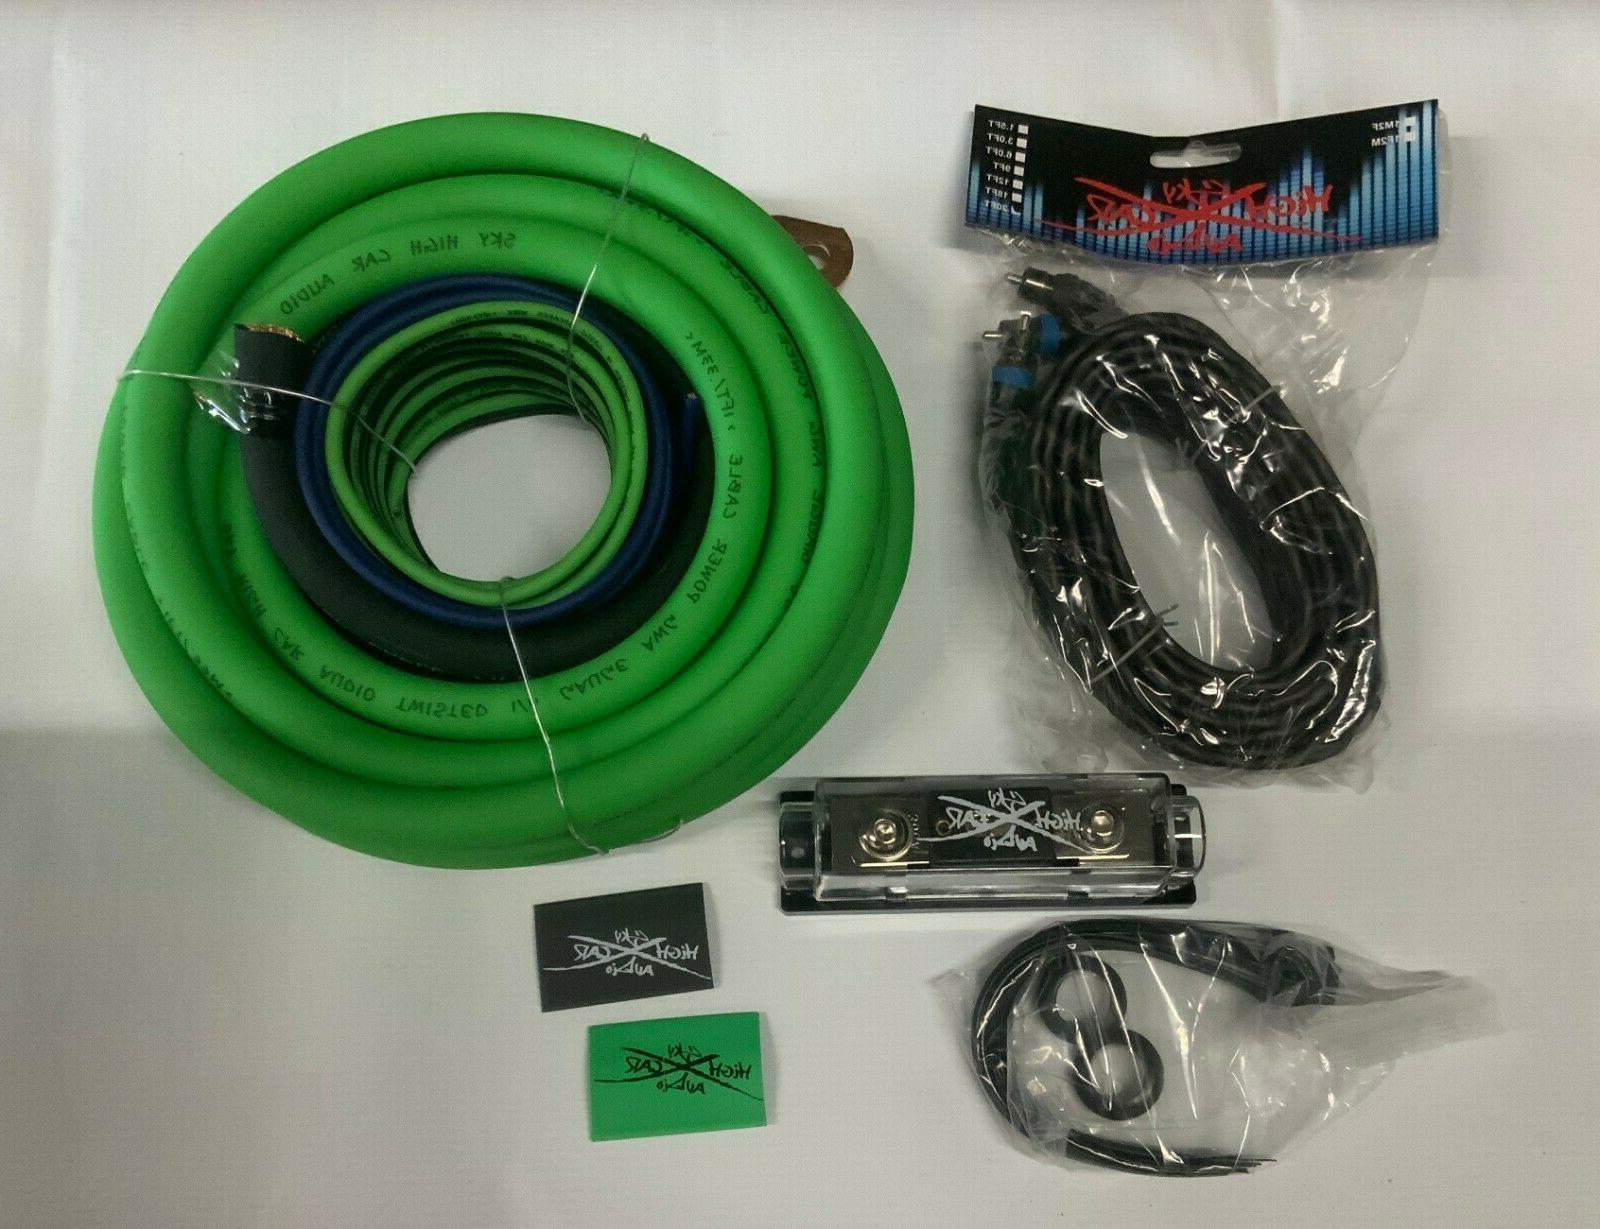 1 0 gauge cca amp kit green